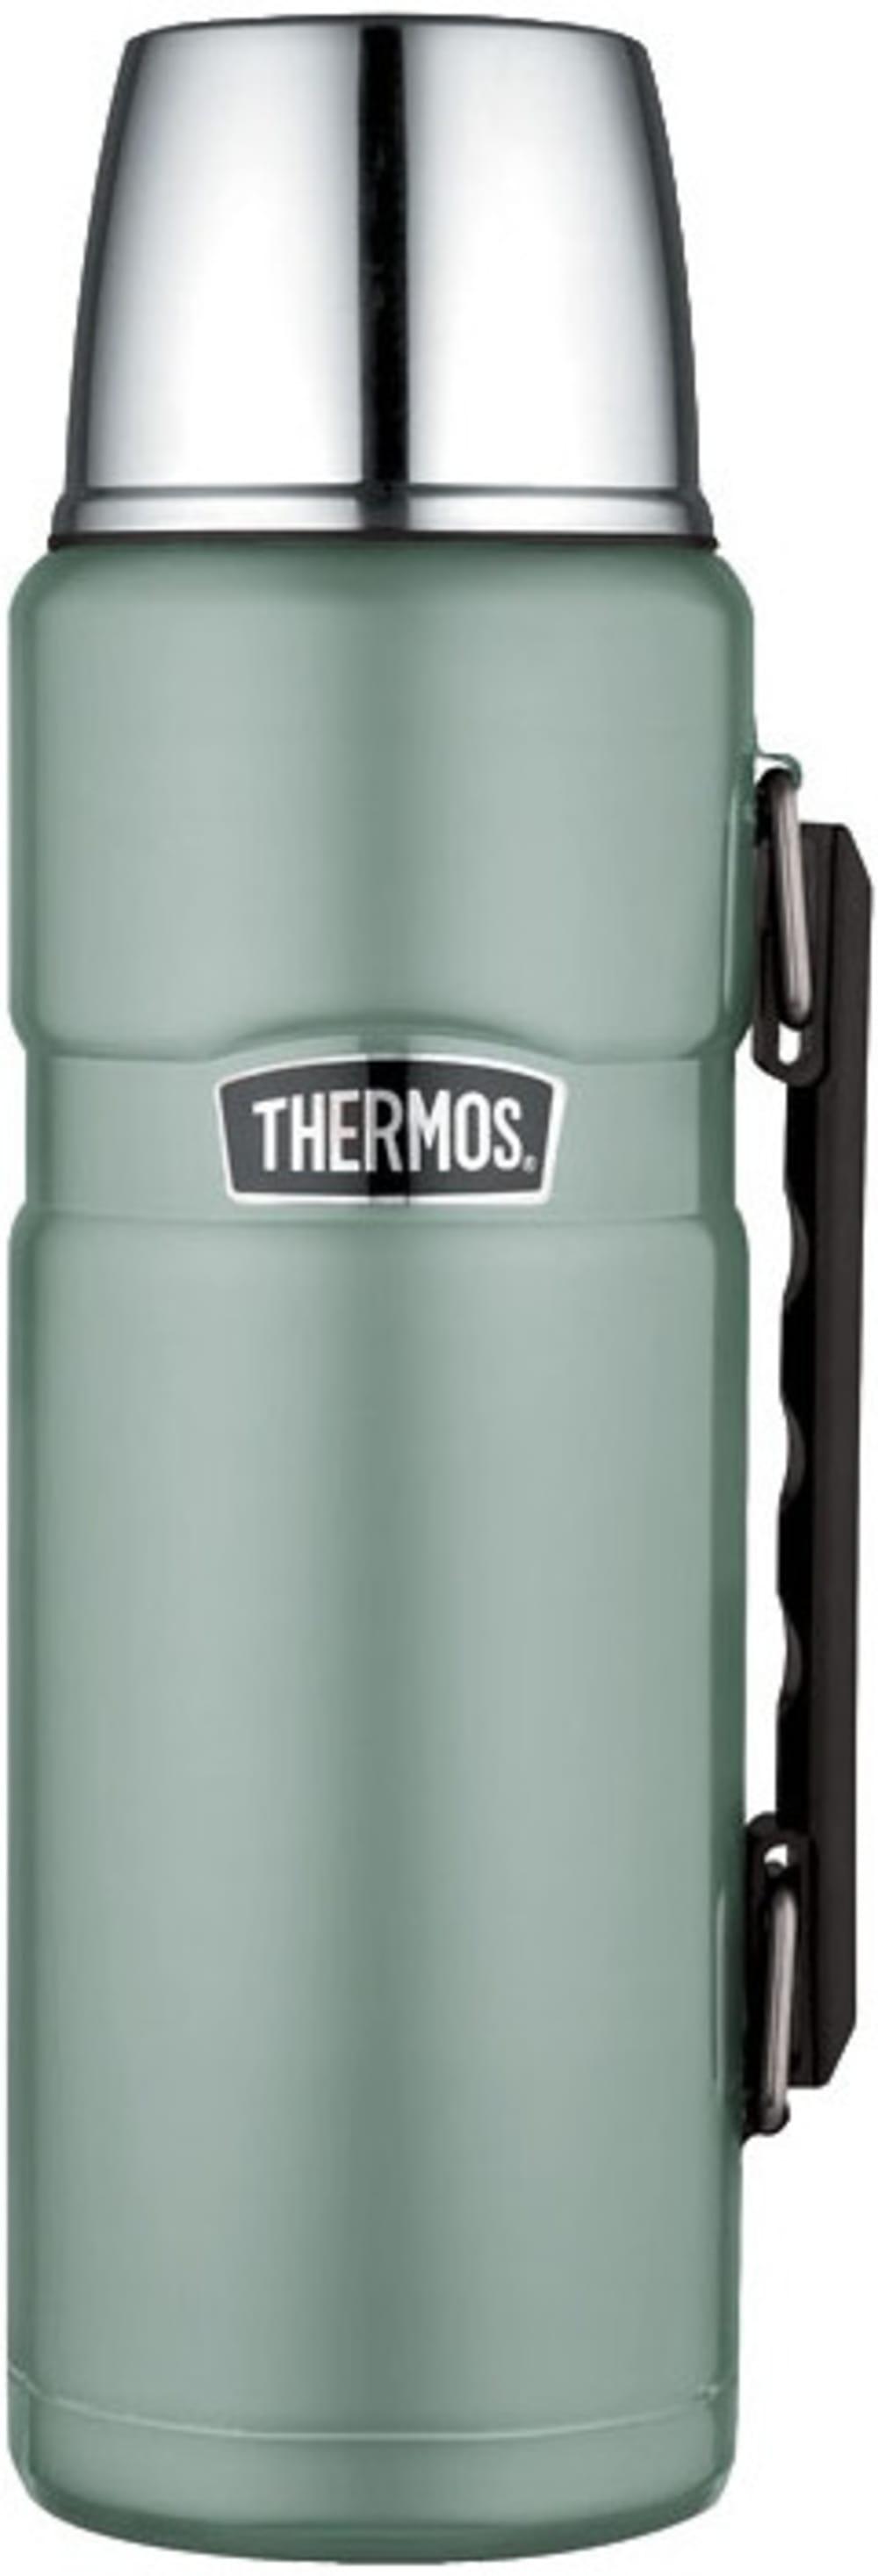 Termos z uchwytem na napoje Thermos Style Duck Egg 1,2l